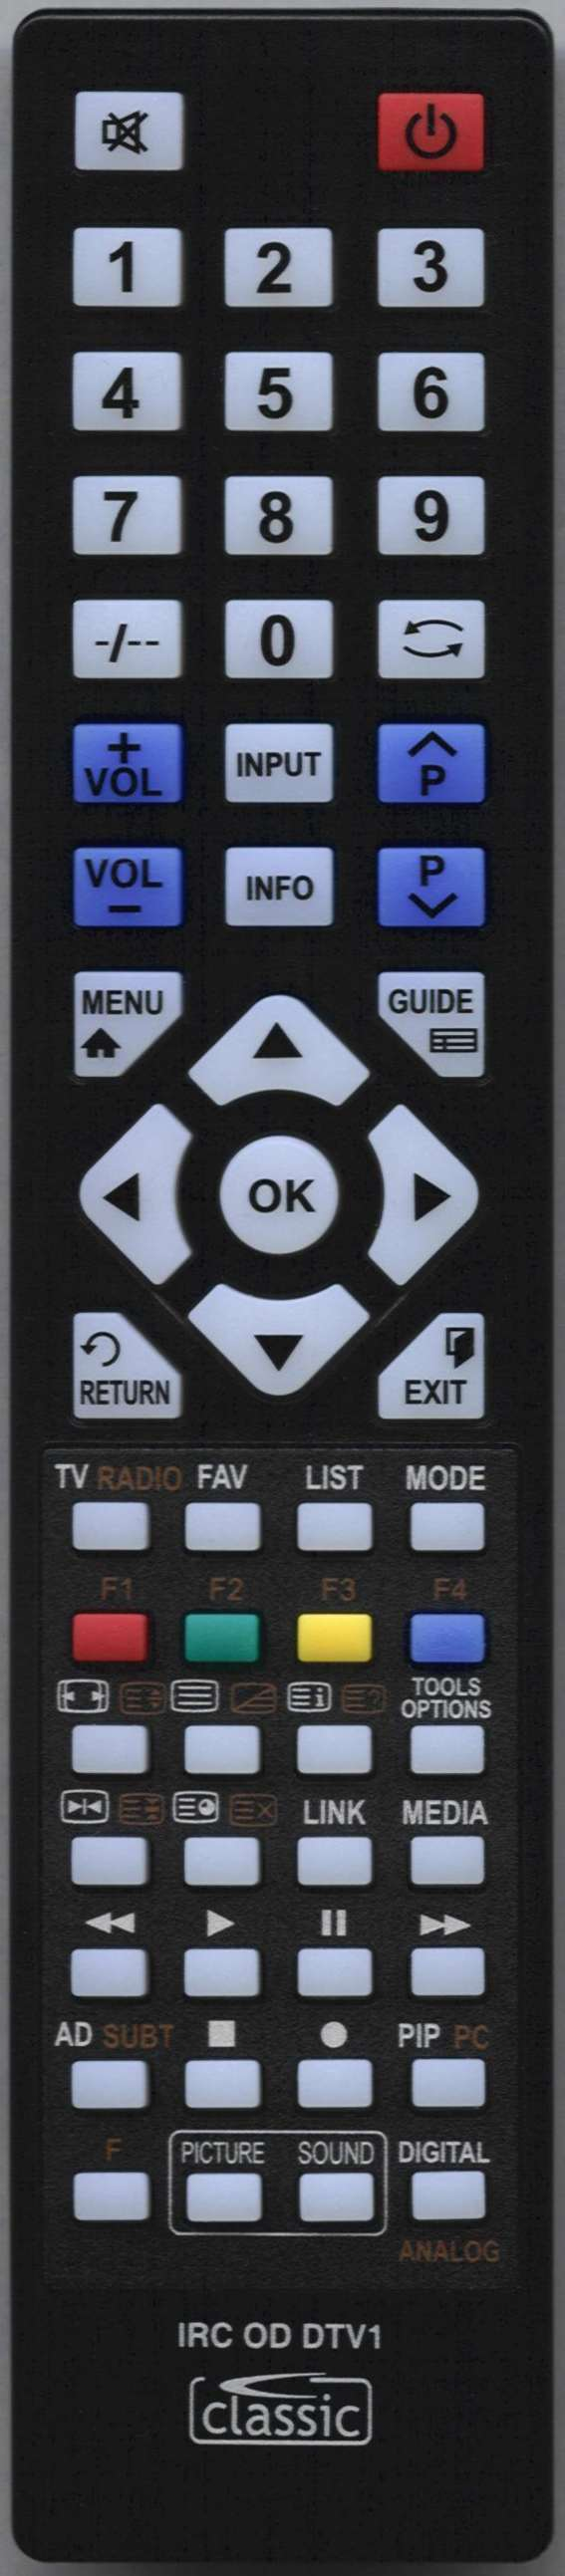 ORION TV32QSI997DVDS Remote Control Alternative